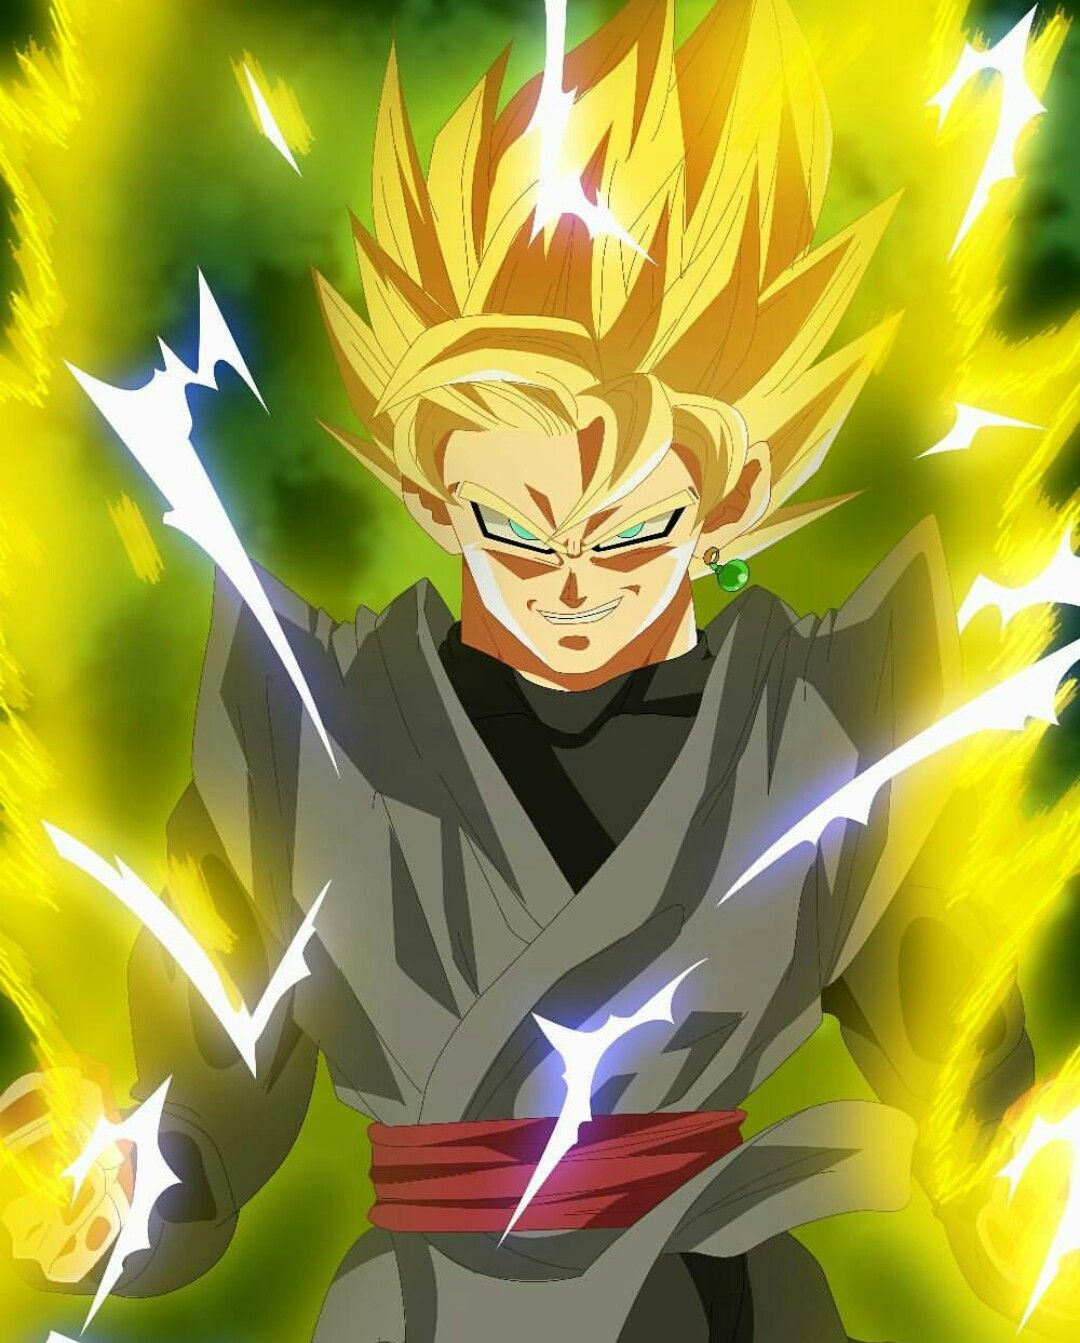 And White Ssj2 Images Black Goku 7